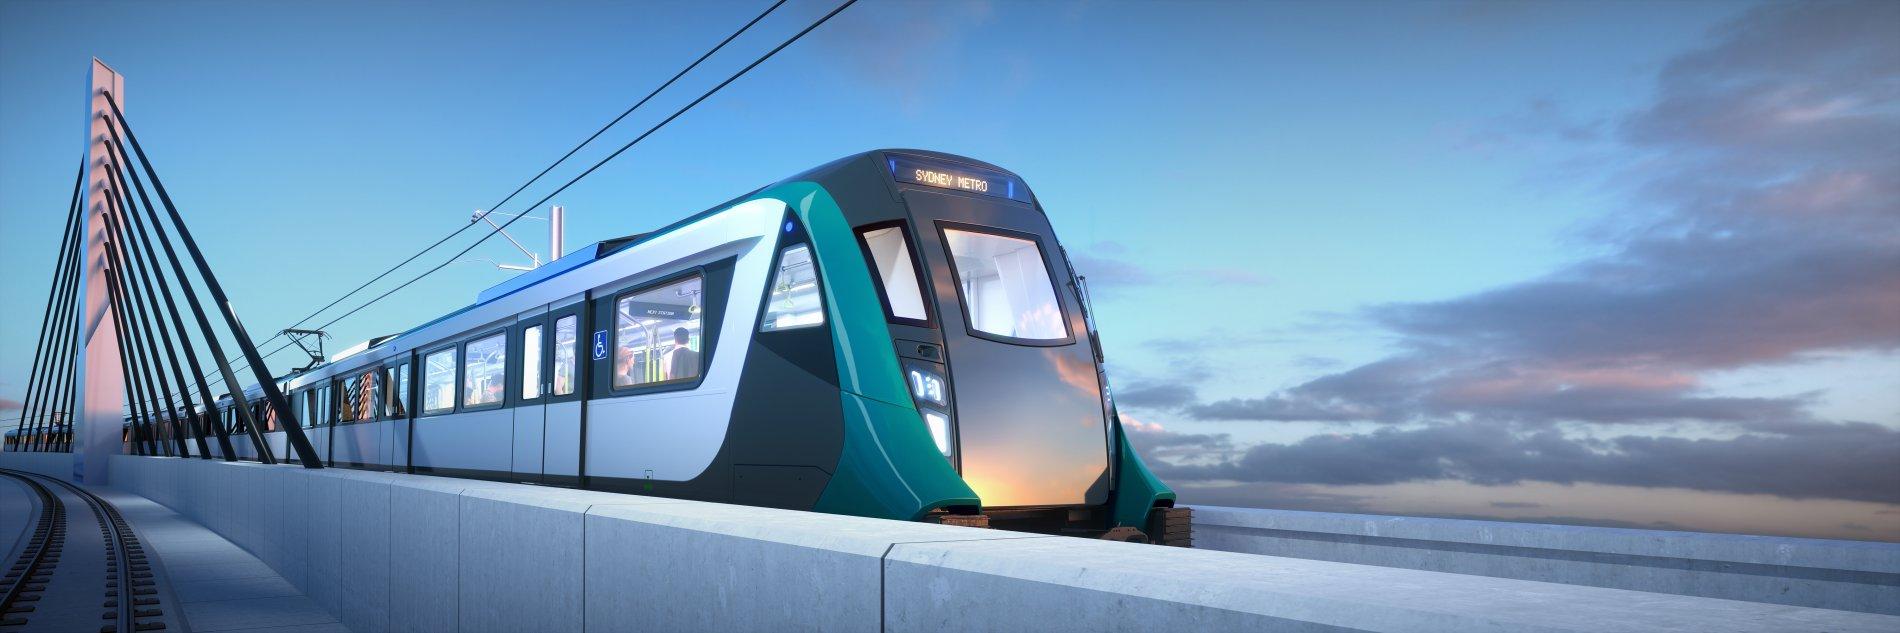 sydney-metro-trains